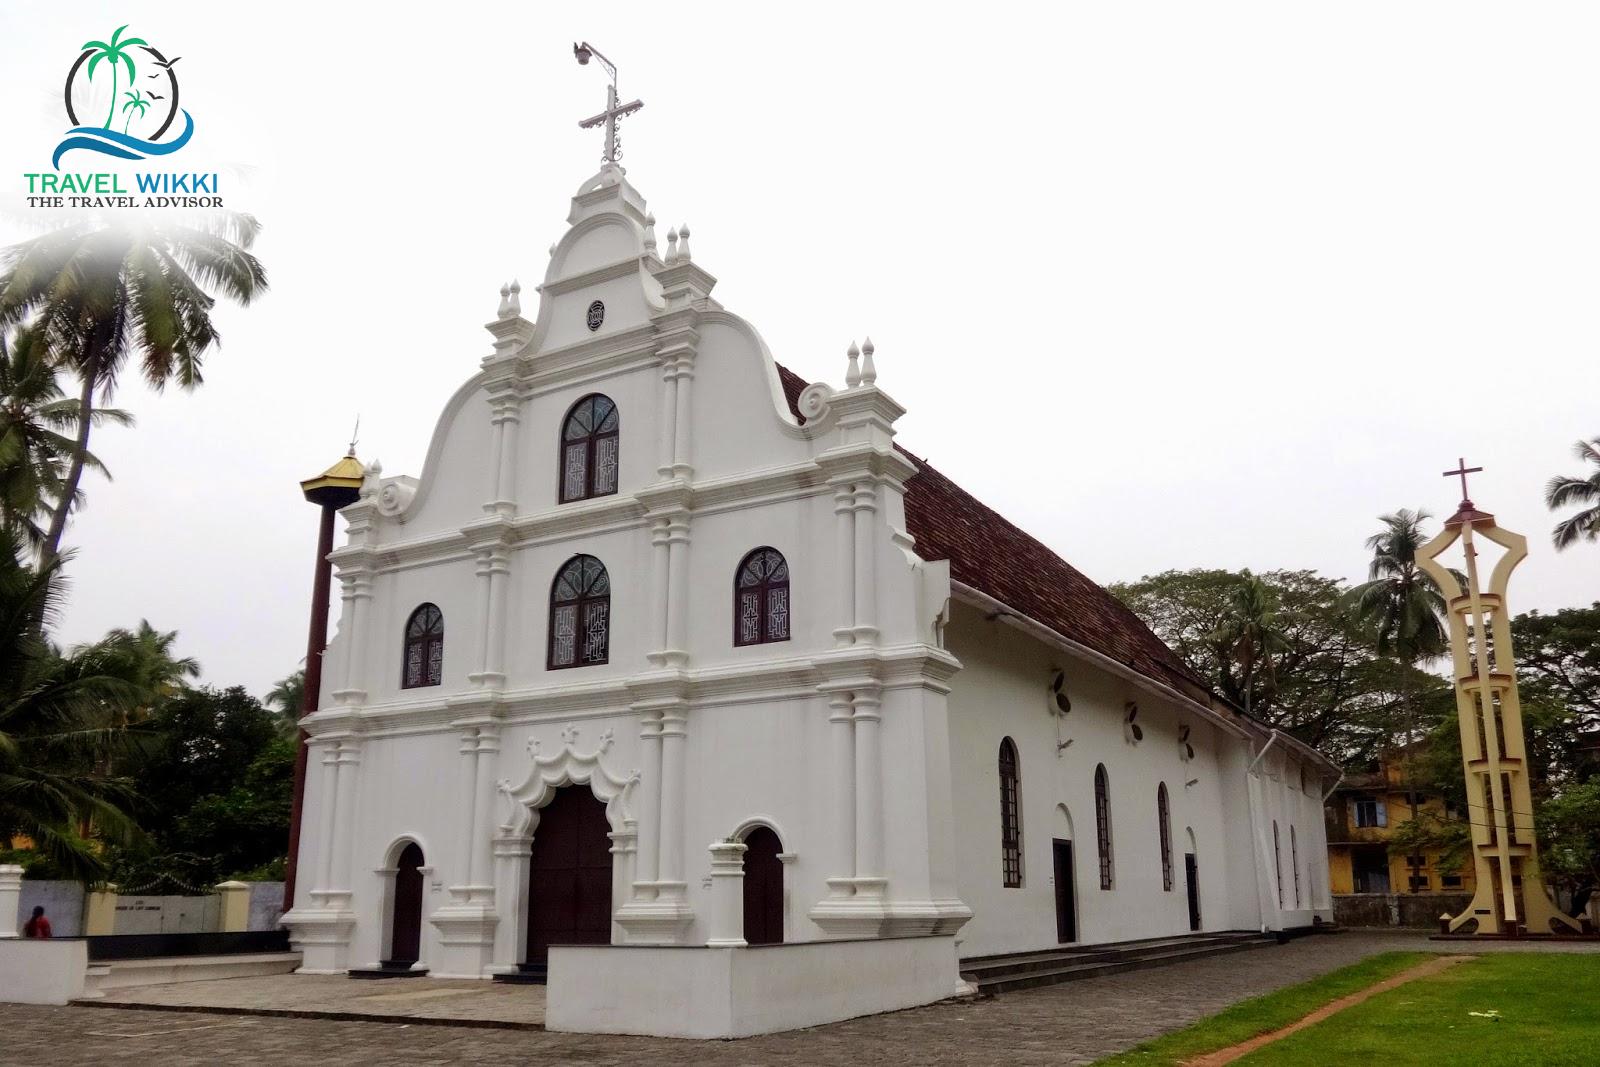 Visit One of The Oldest Churches in Kochi, Santa Cruz Basilica